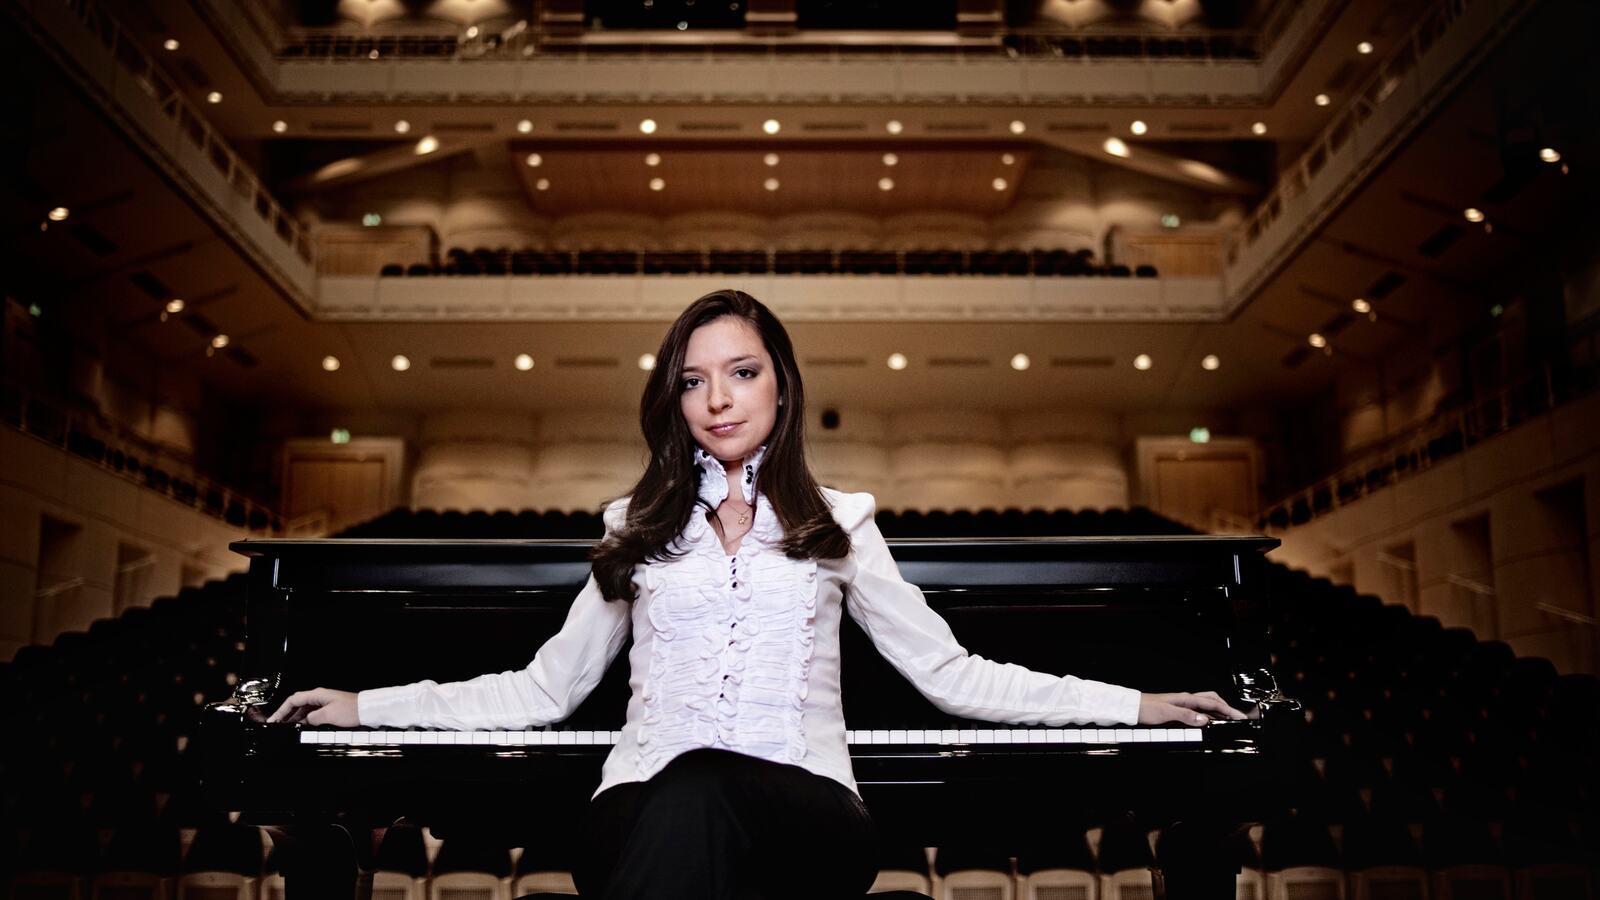 Yulianna Avdeeva, pianist